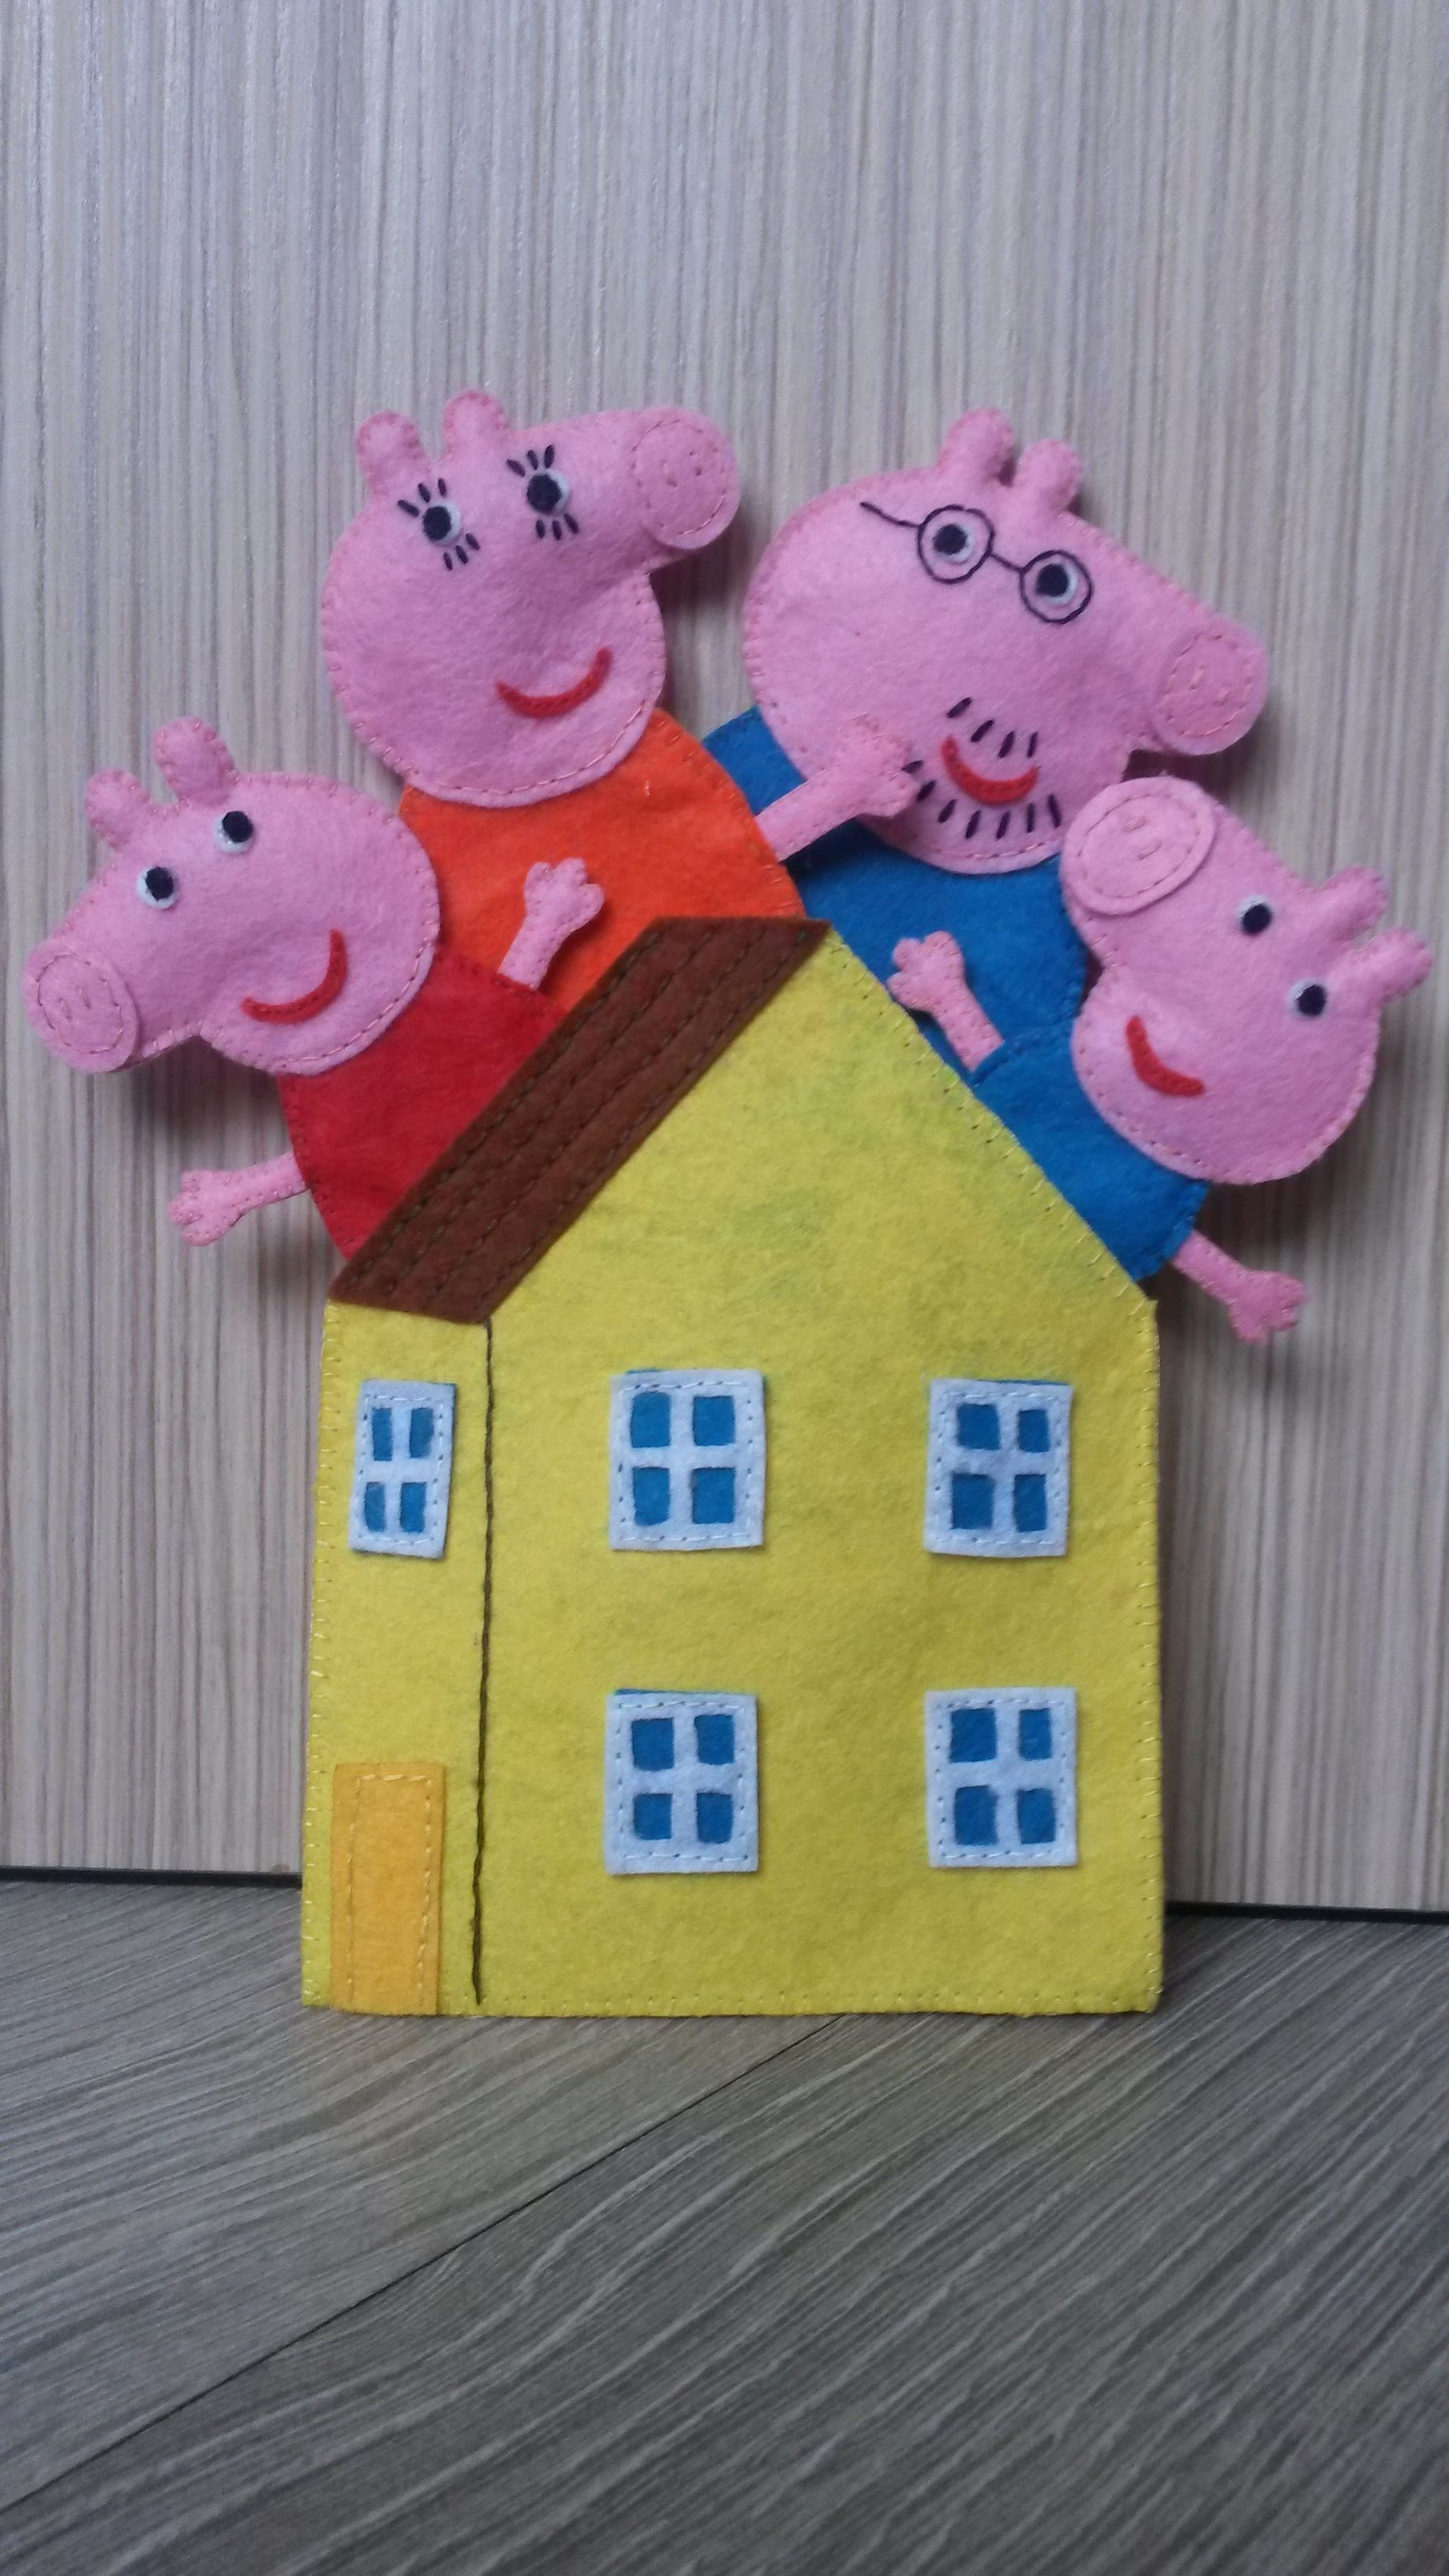 Peppa pig, Finger Theatre, felt, the product of felt, handmade ...